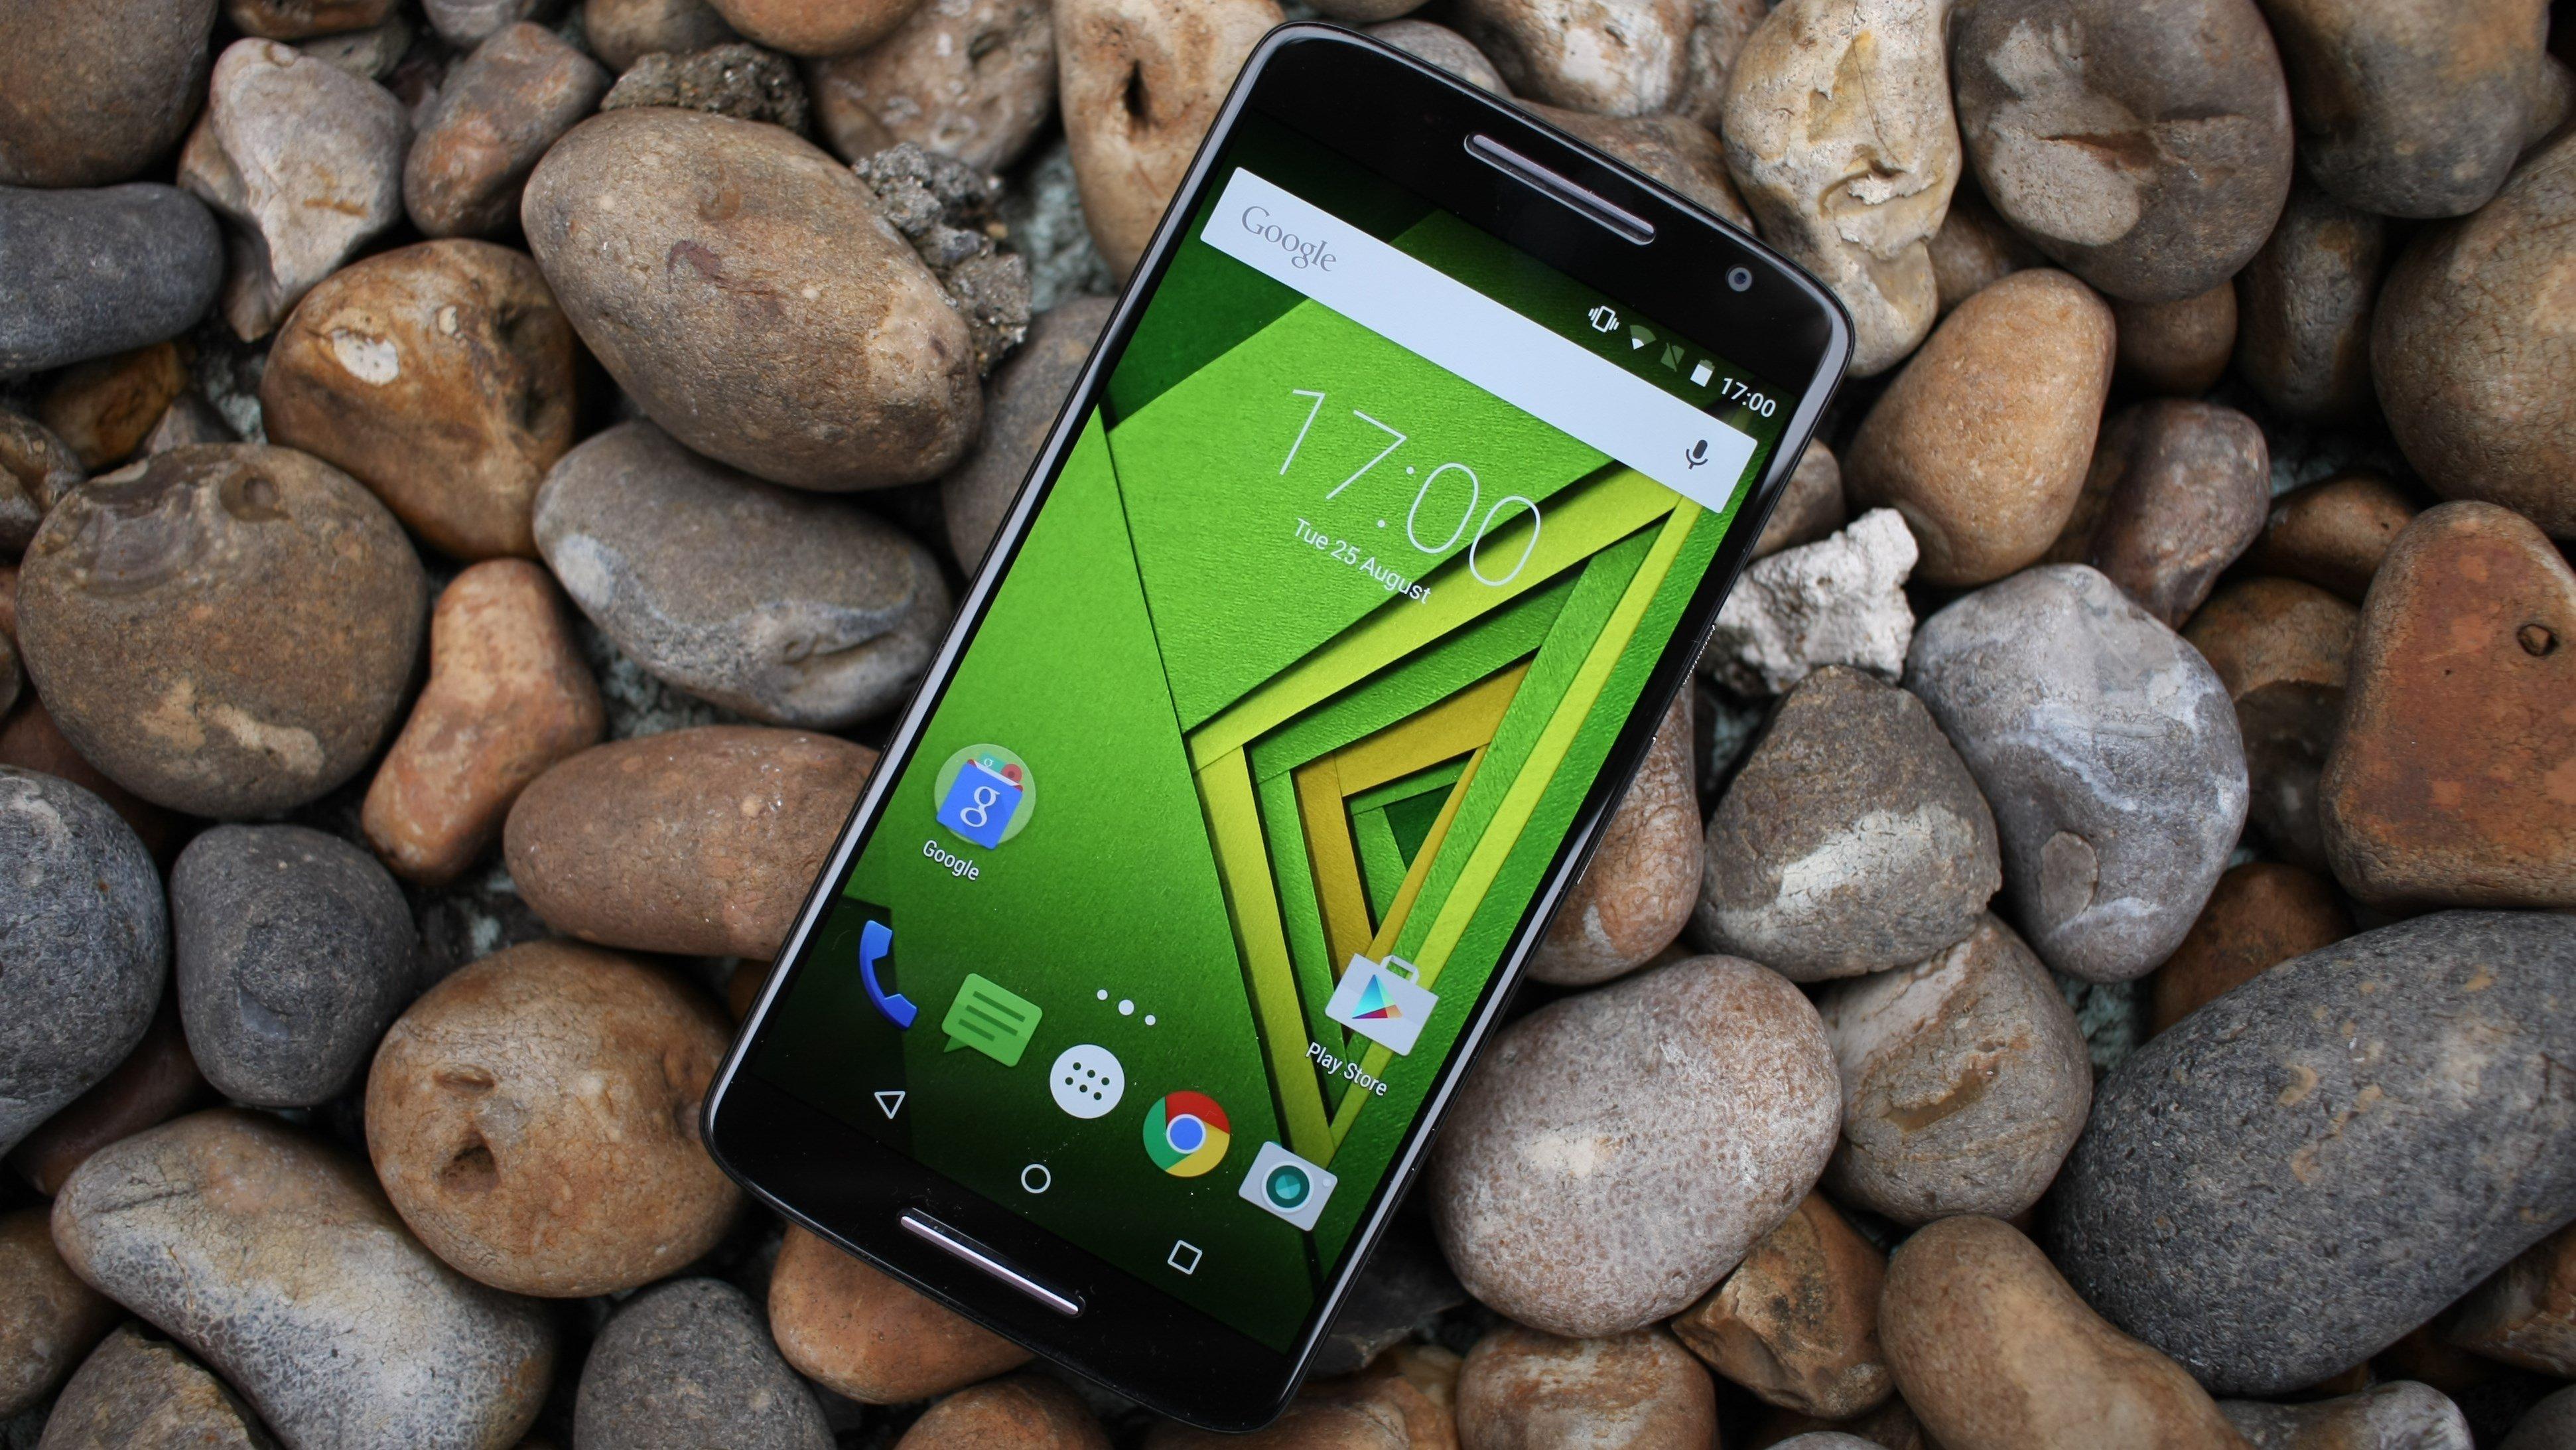 Motorola moto x play review still a solid choice expert reviews ccuart Choice Image